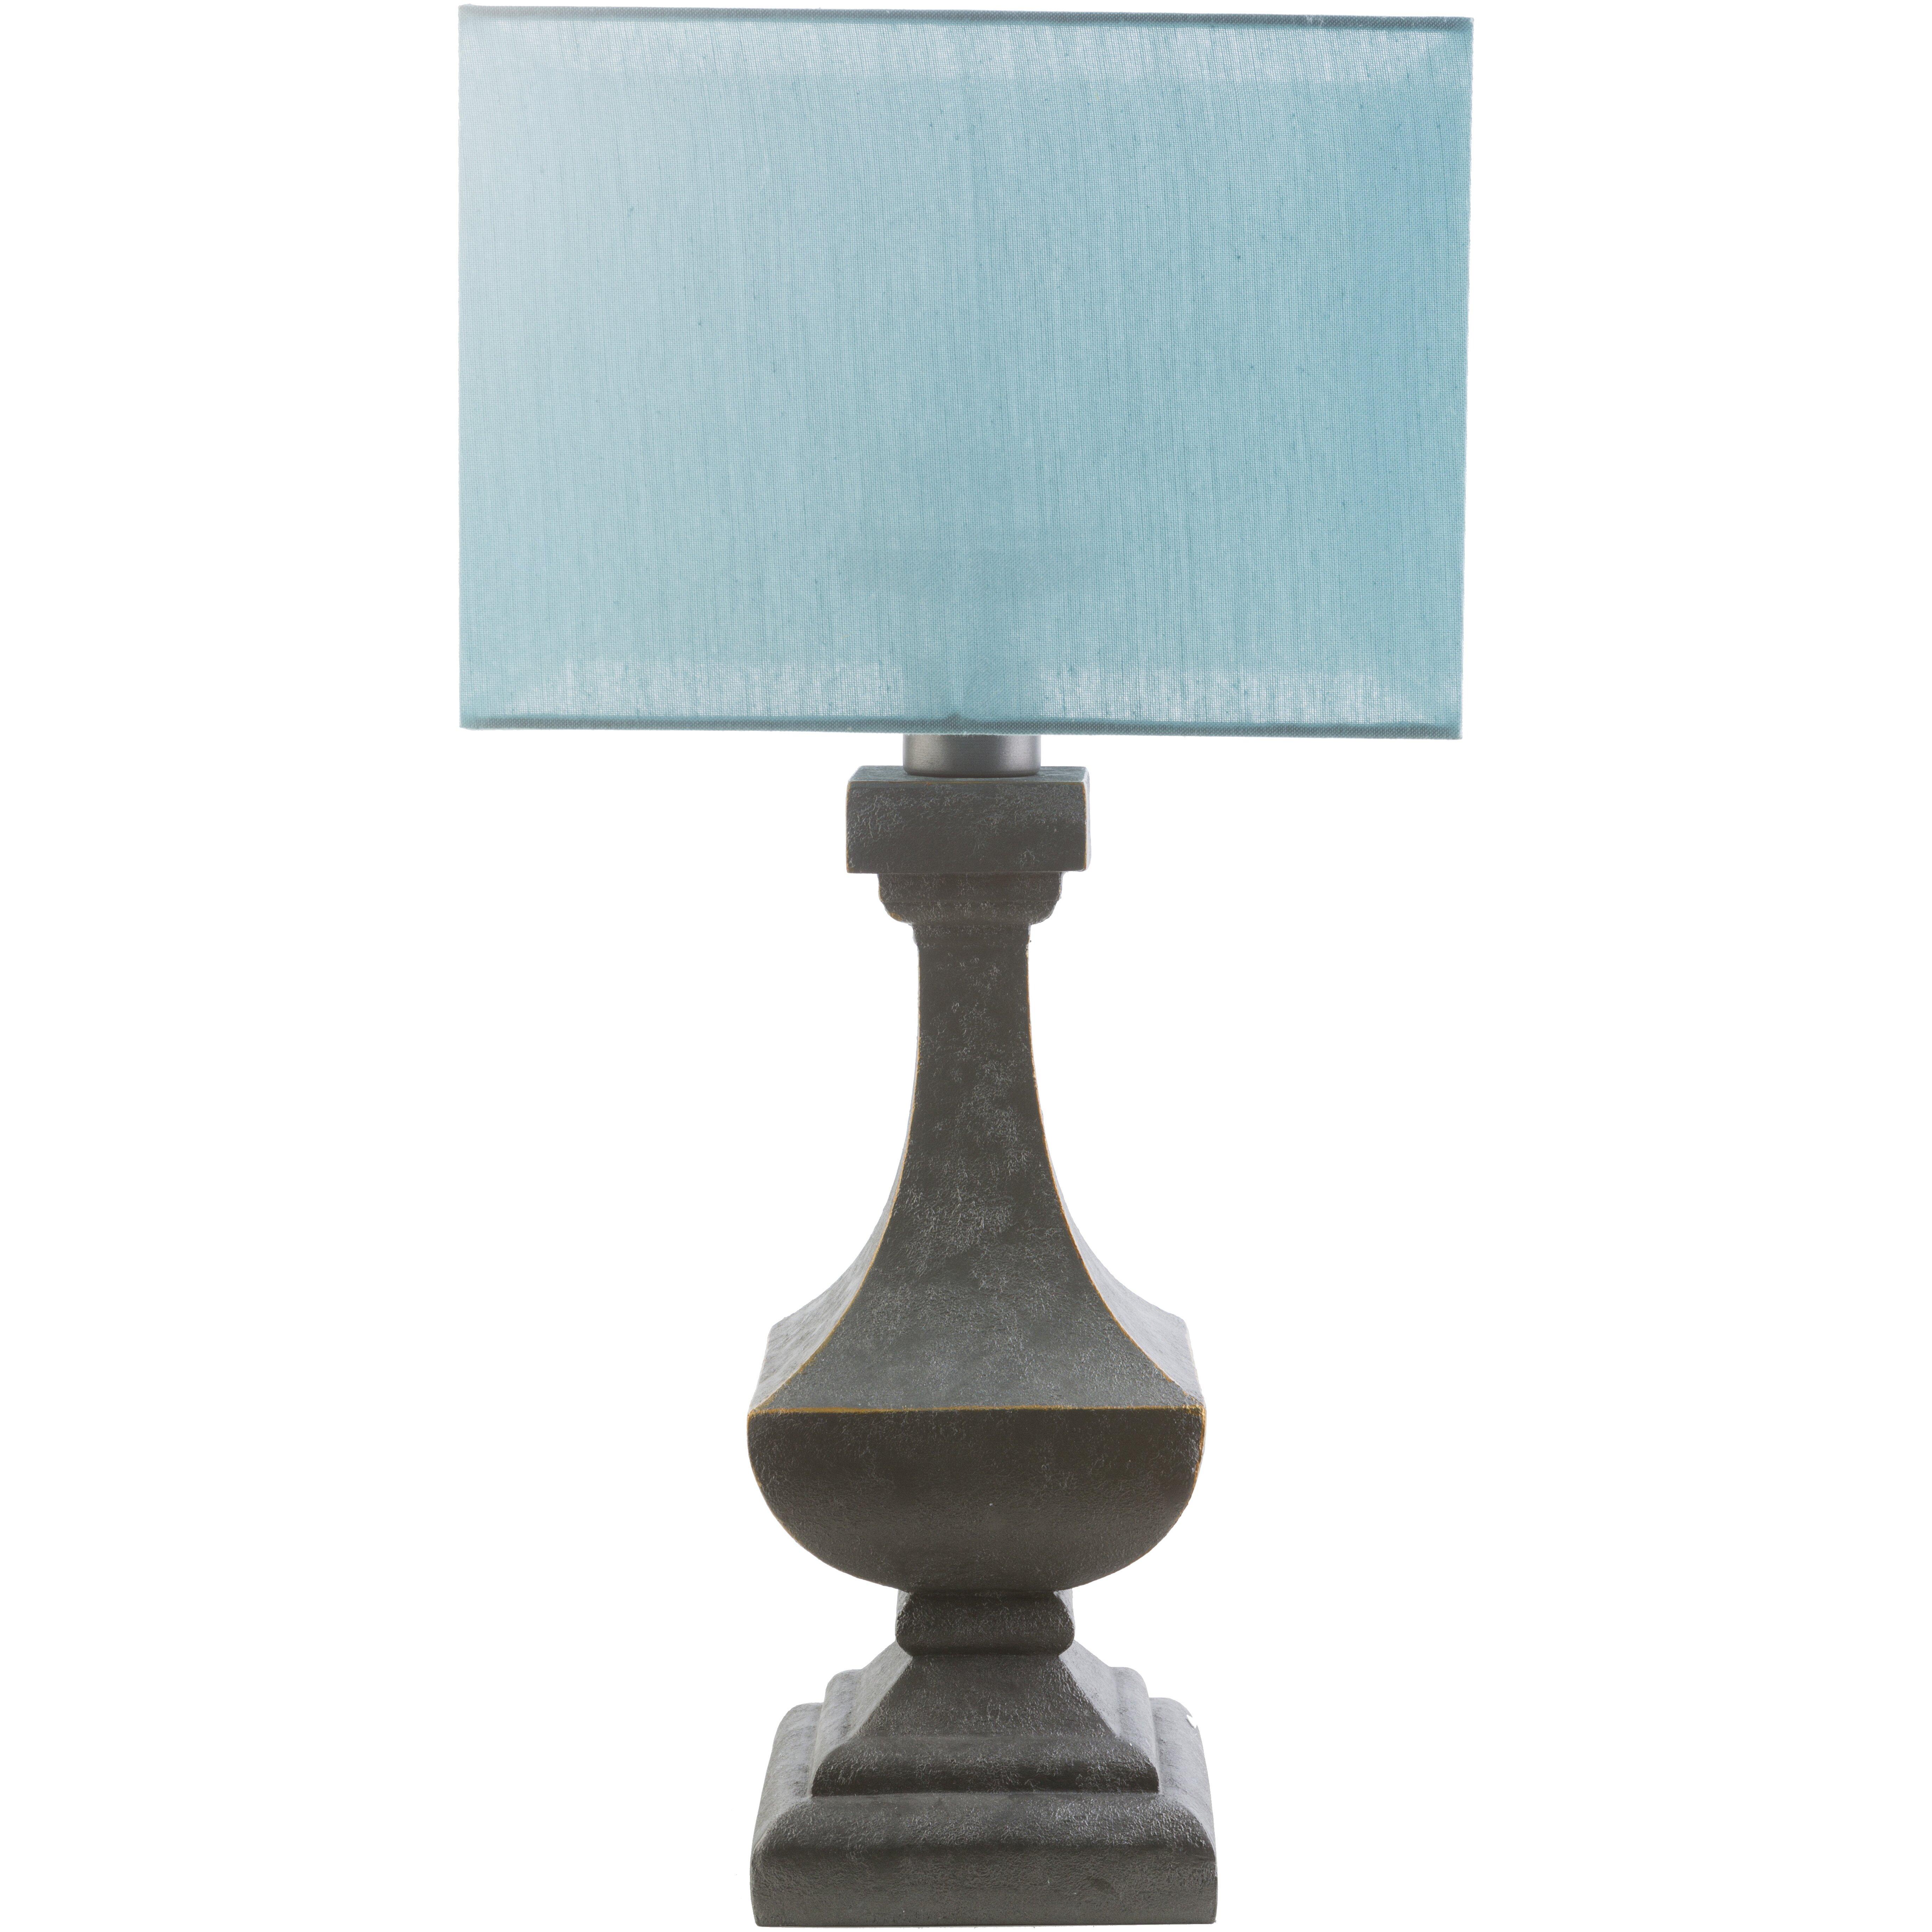 lighting lamps table lamps alcott hill sku alct1588. Black Bedroom Furniture Sets. Home Design Ideas